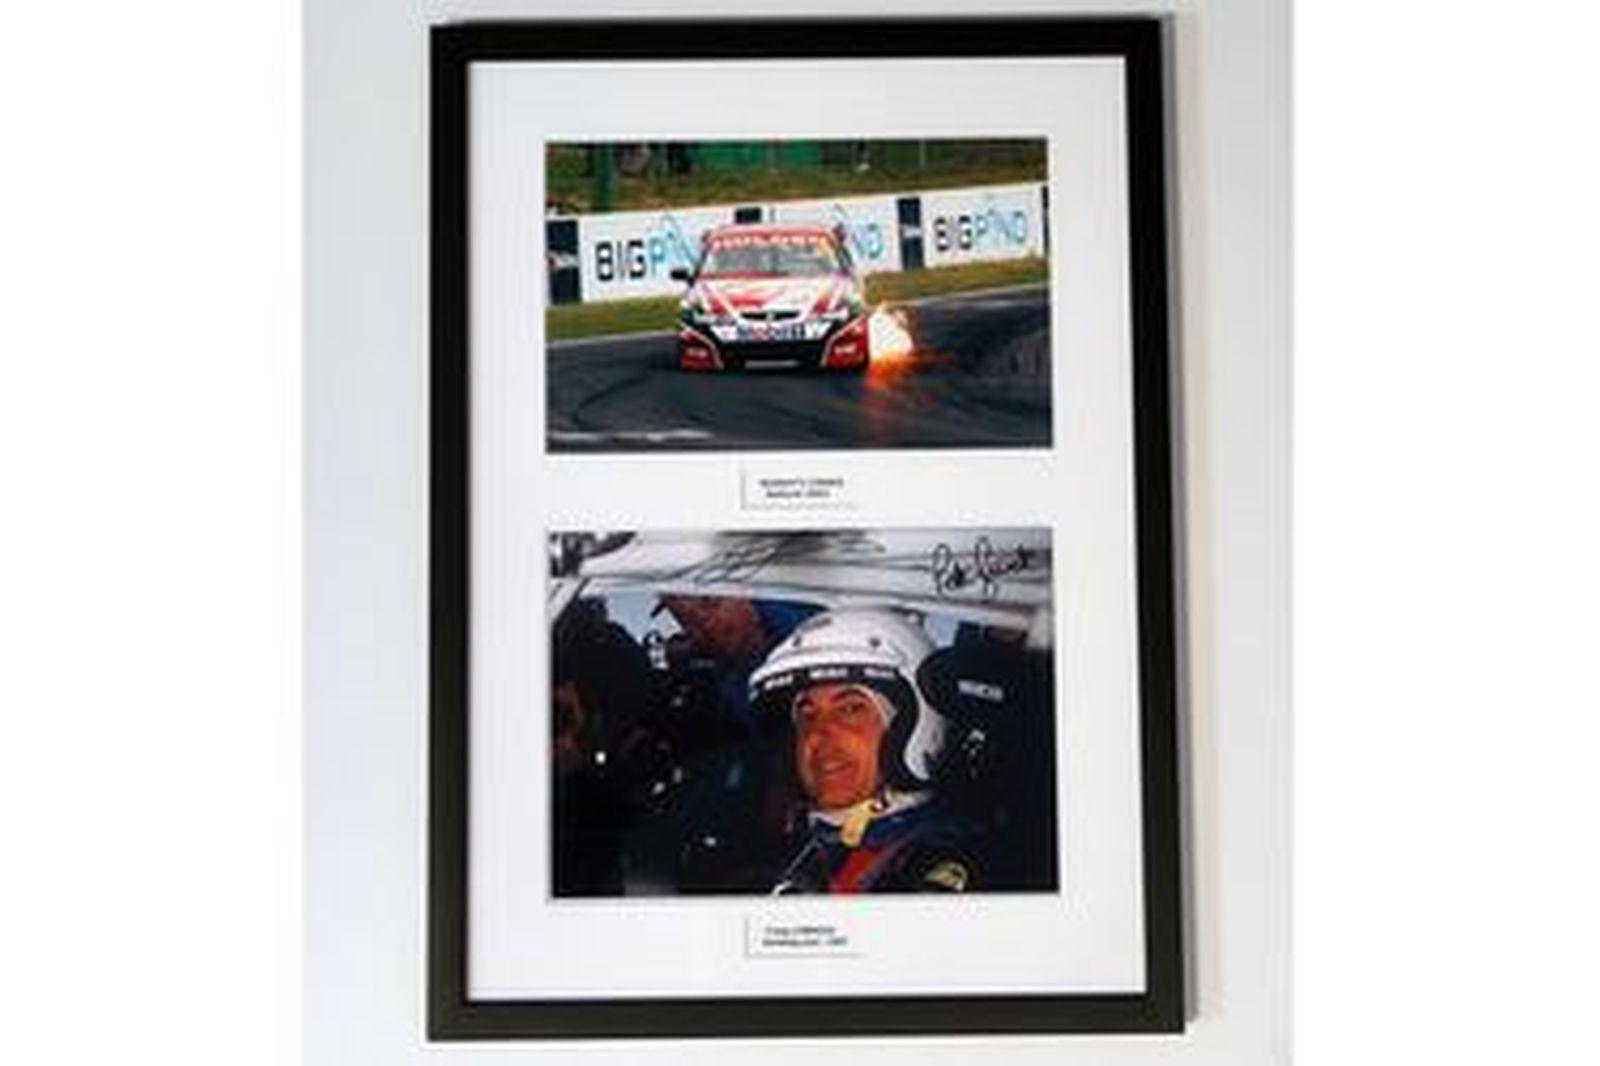 Framed Signed Photos - 2 x Peter Brock Murray's Corner, Bathurst 2004, Holden Racing Lakeside 1997